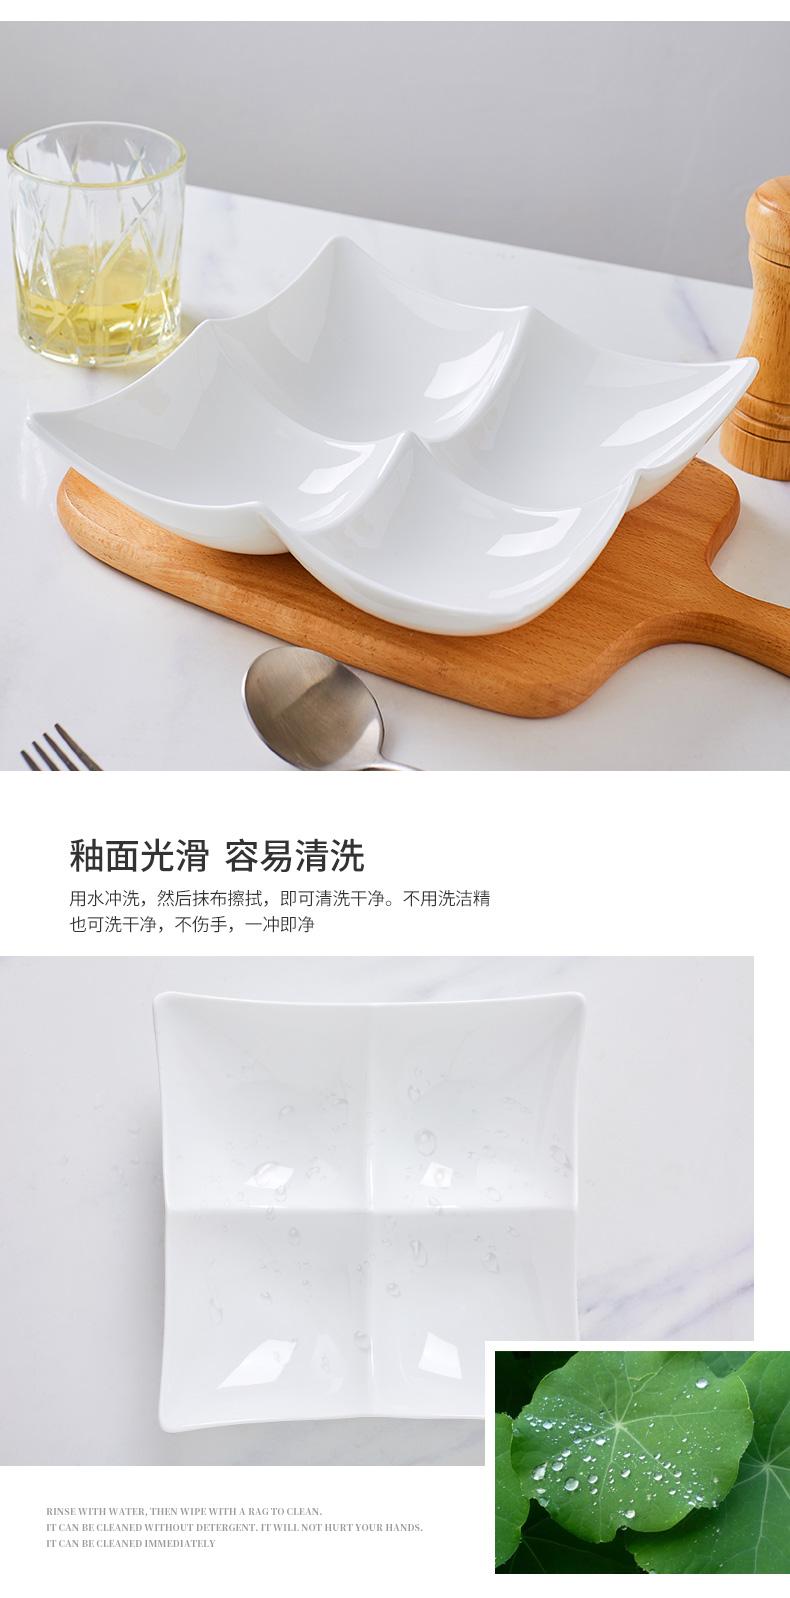 Jingdezhen porcelain compote up phnom penh ipads ceramic light sitting room key-2 luxury fruit snacks plate frame snack plate of the home plate